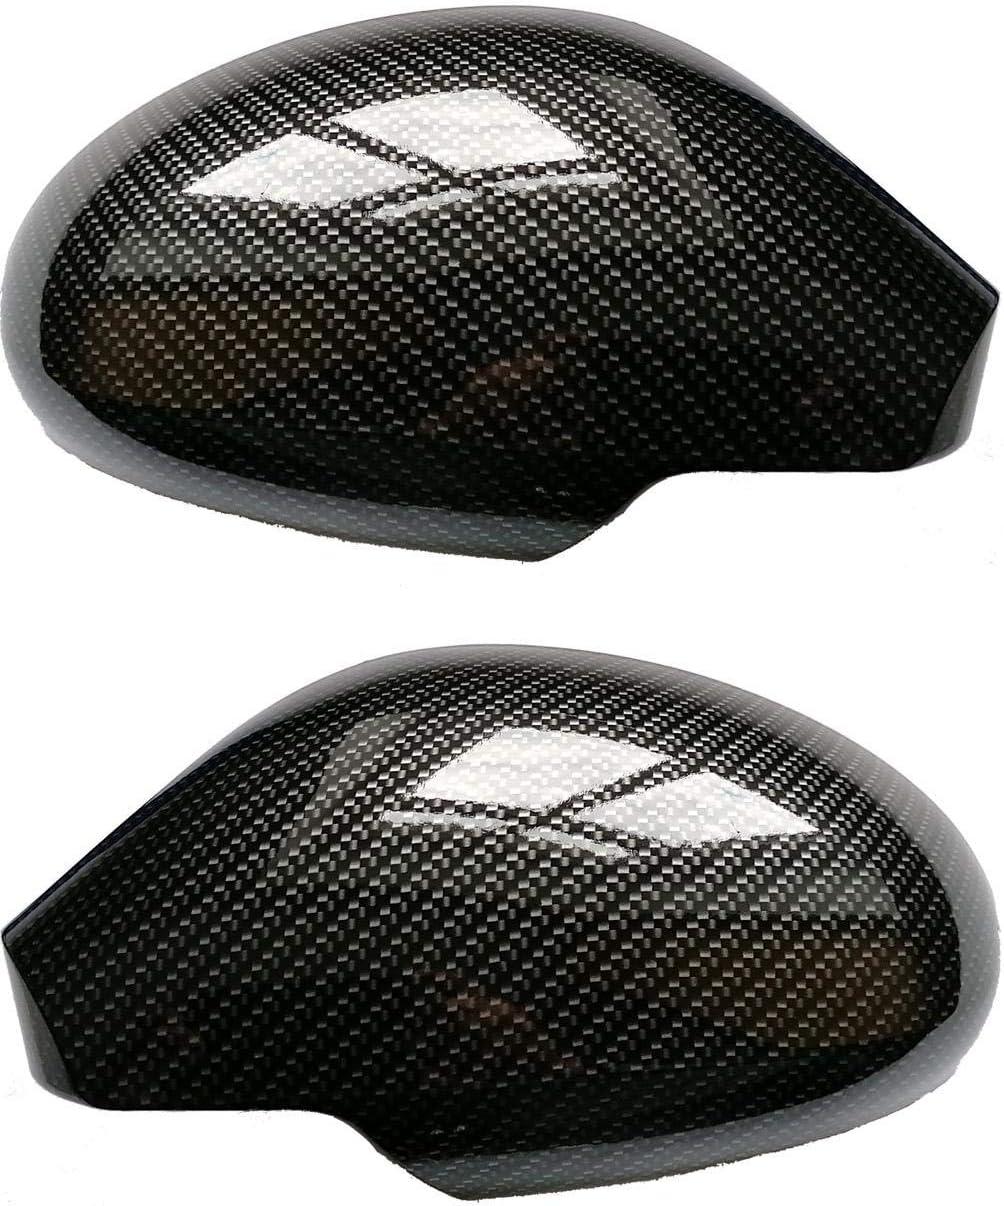 Set Spiegelkappen Geh/äuse Carbon-Optik passend f/ür Ibiza 3 Cordoba Toledo 3 Altea Wassertransferdruck